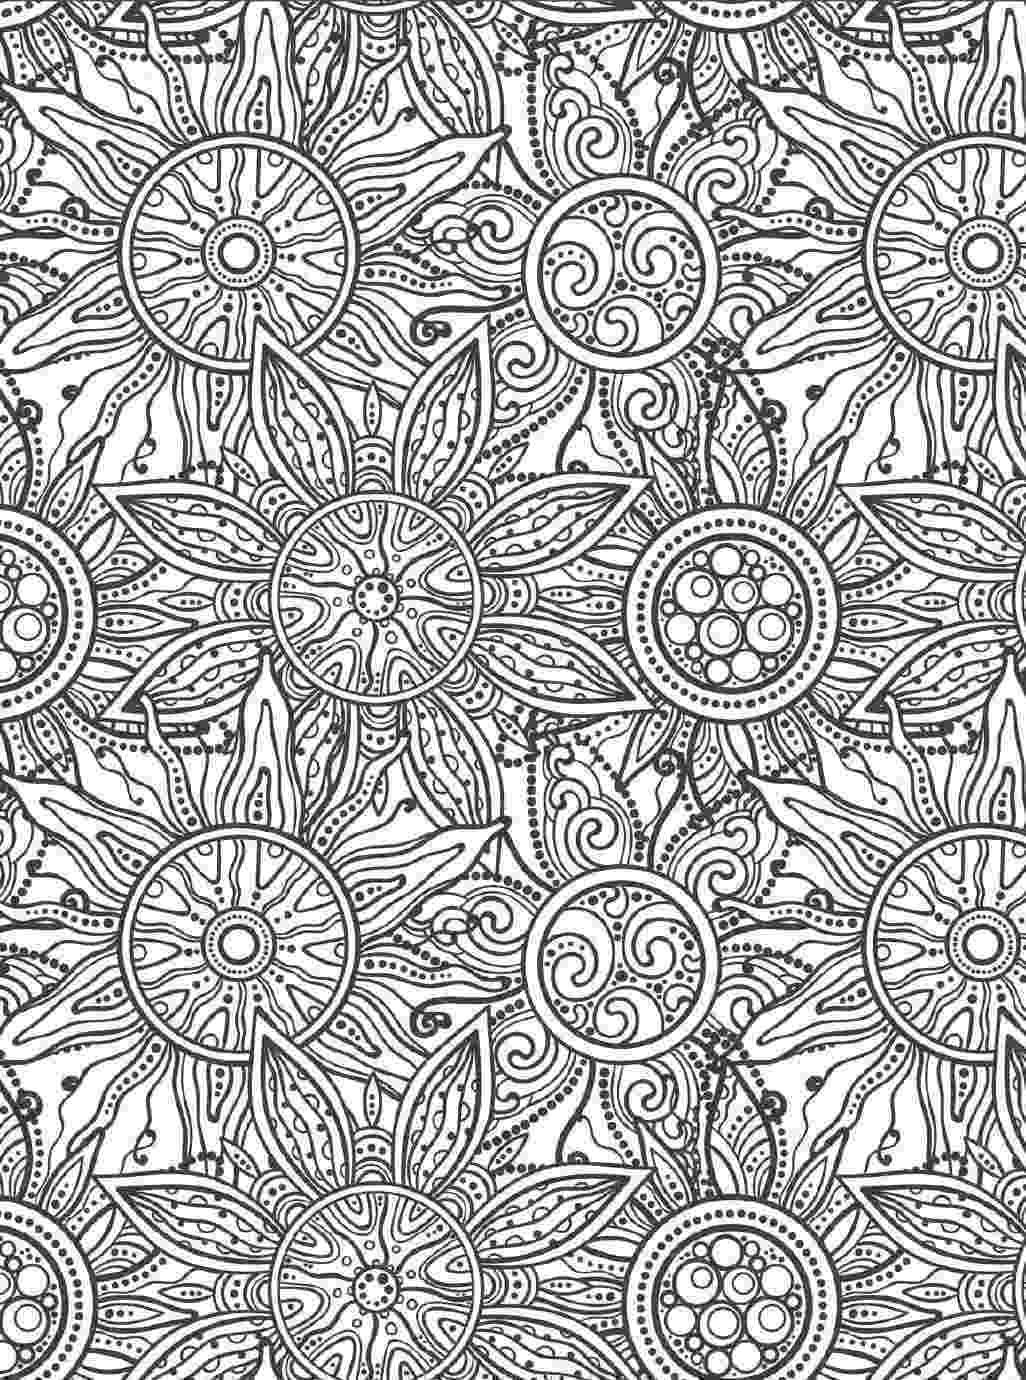 floral designs coloring book beautiful flowers detailed floral designs coloring book coloring floral designs book 1 3